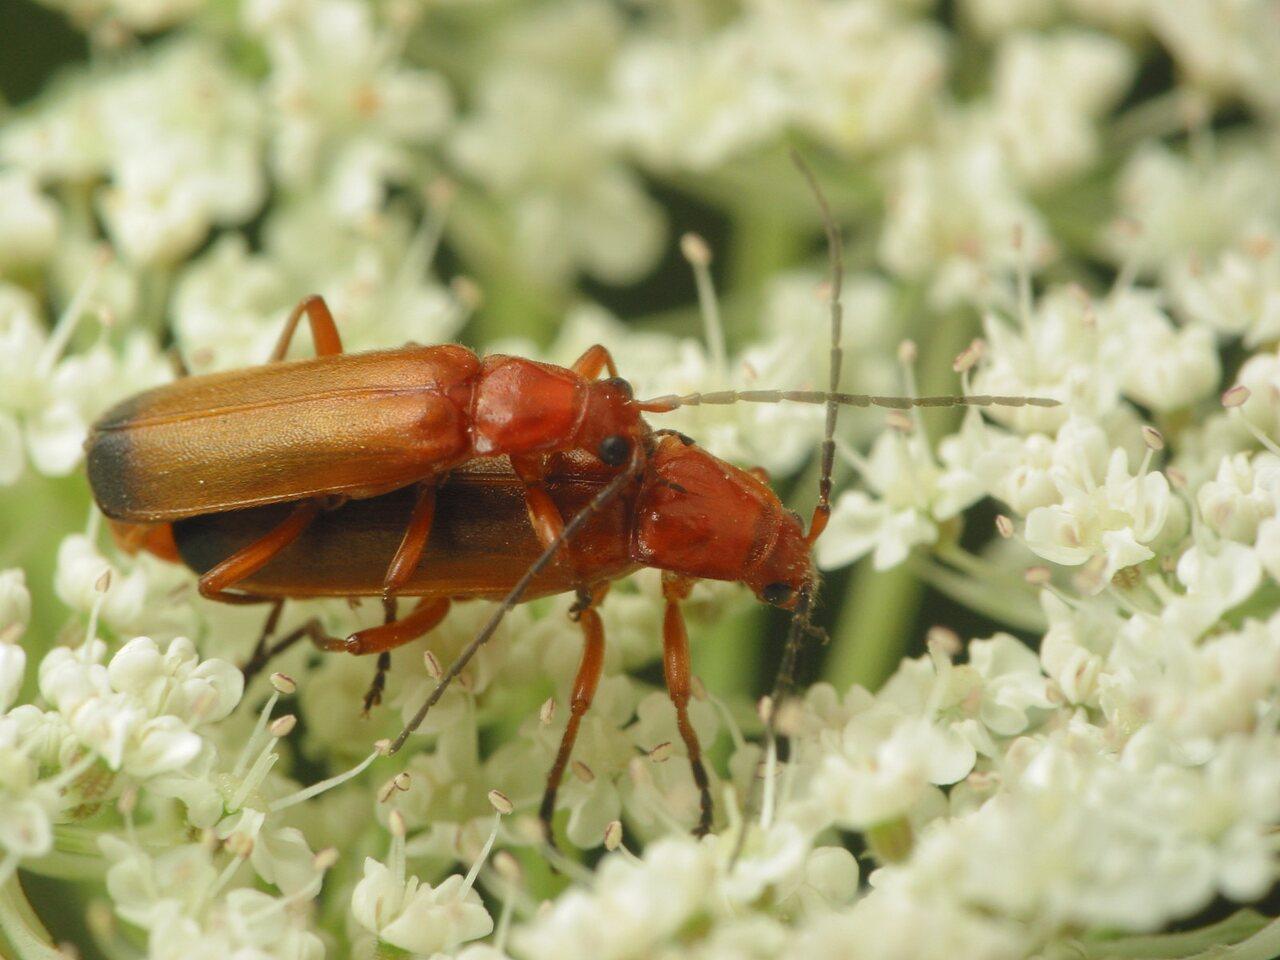 Rhagonycha-fulva-3616.jpg